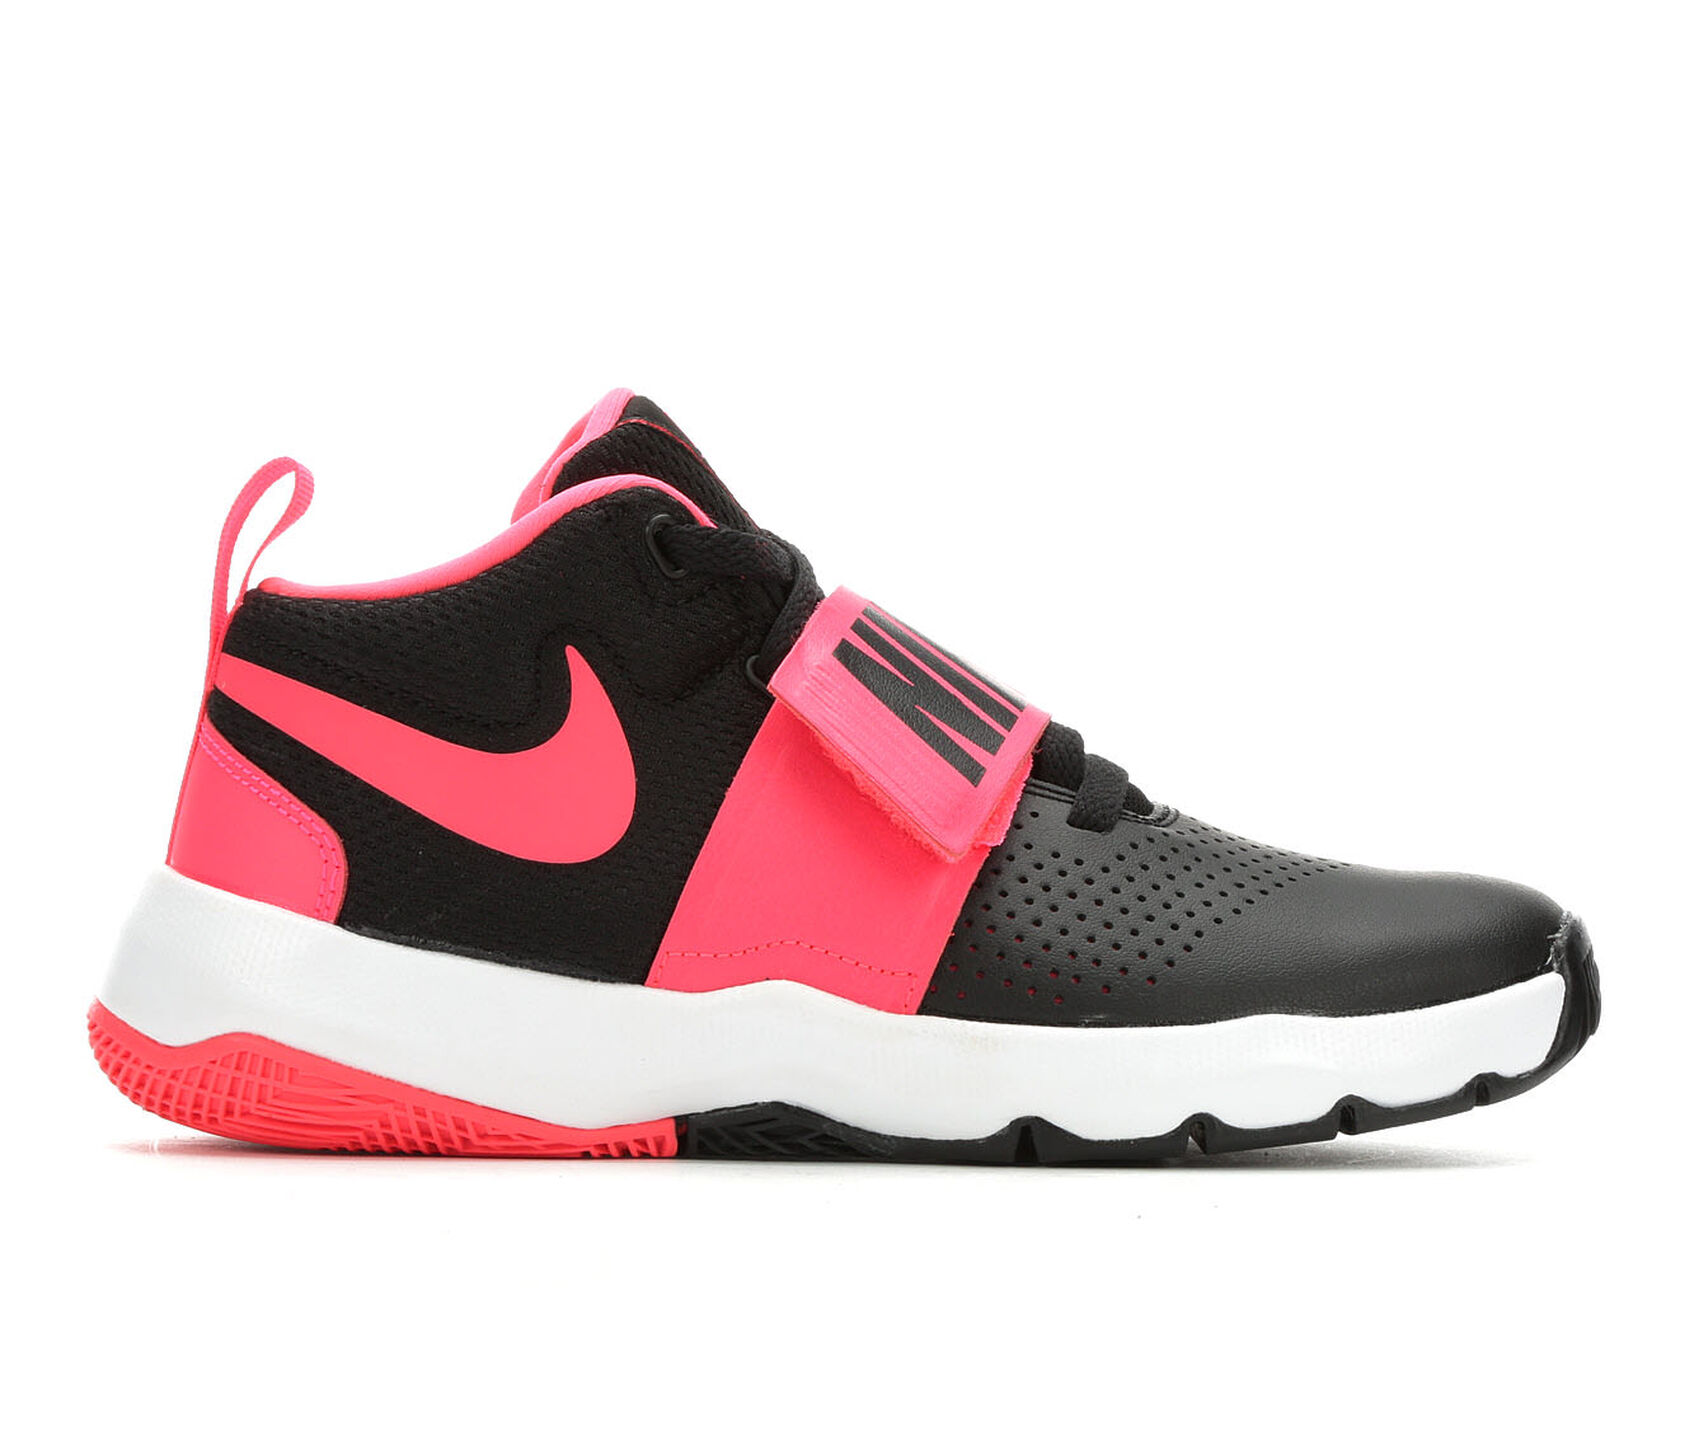 Nike basketball shoes for girls